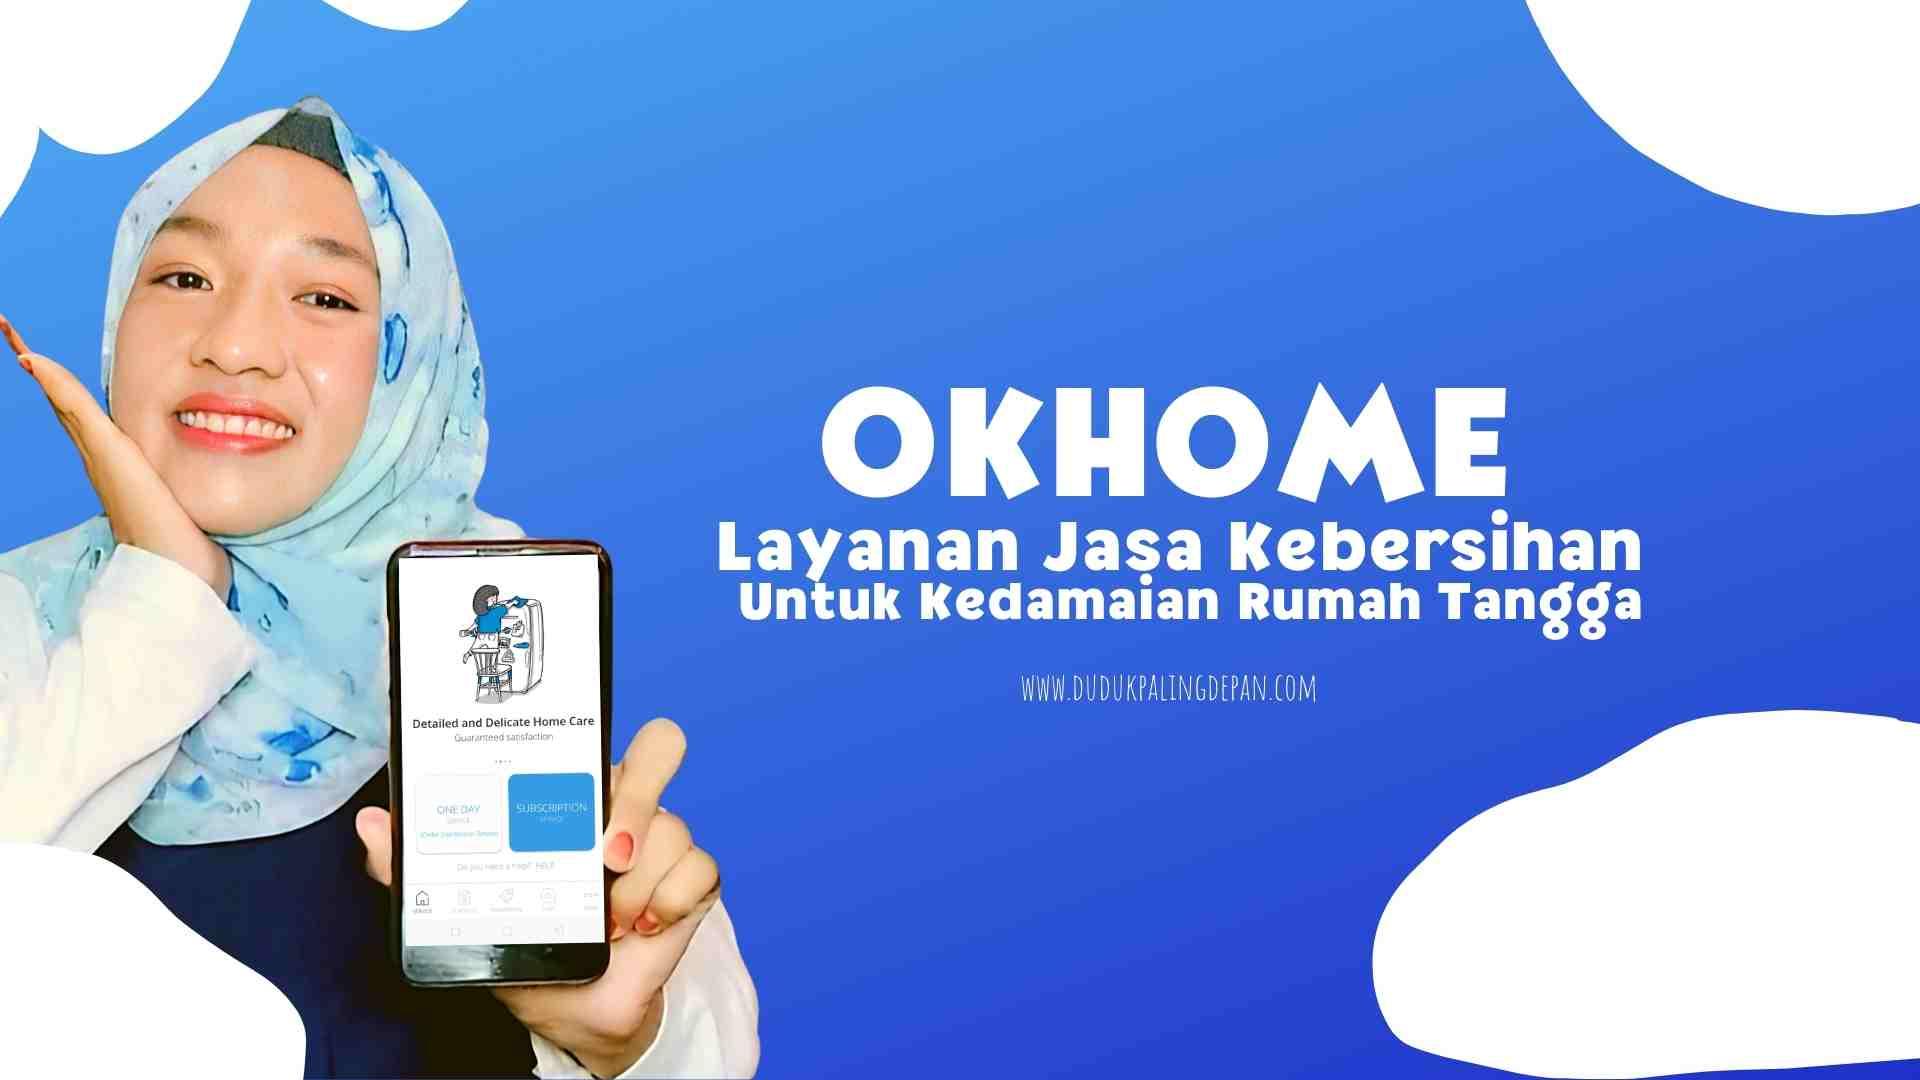 okhome layanan jasa kebersihan rumah